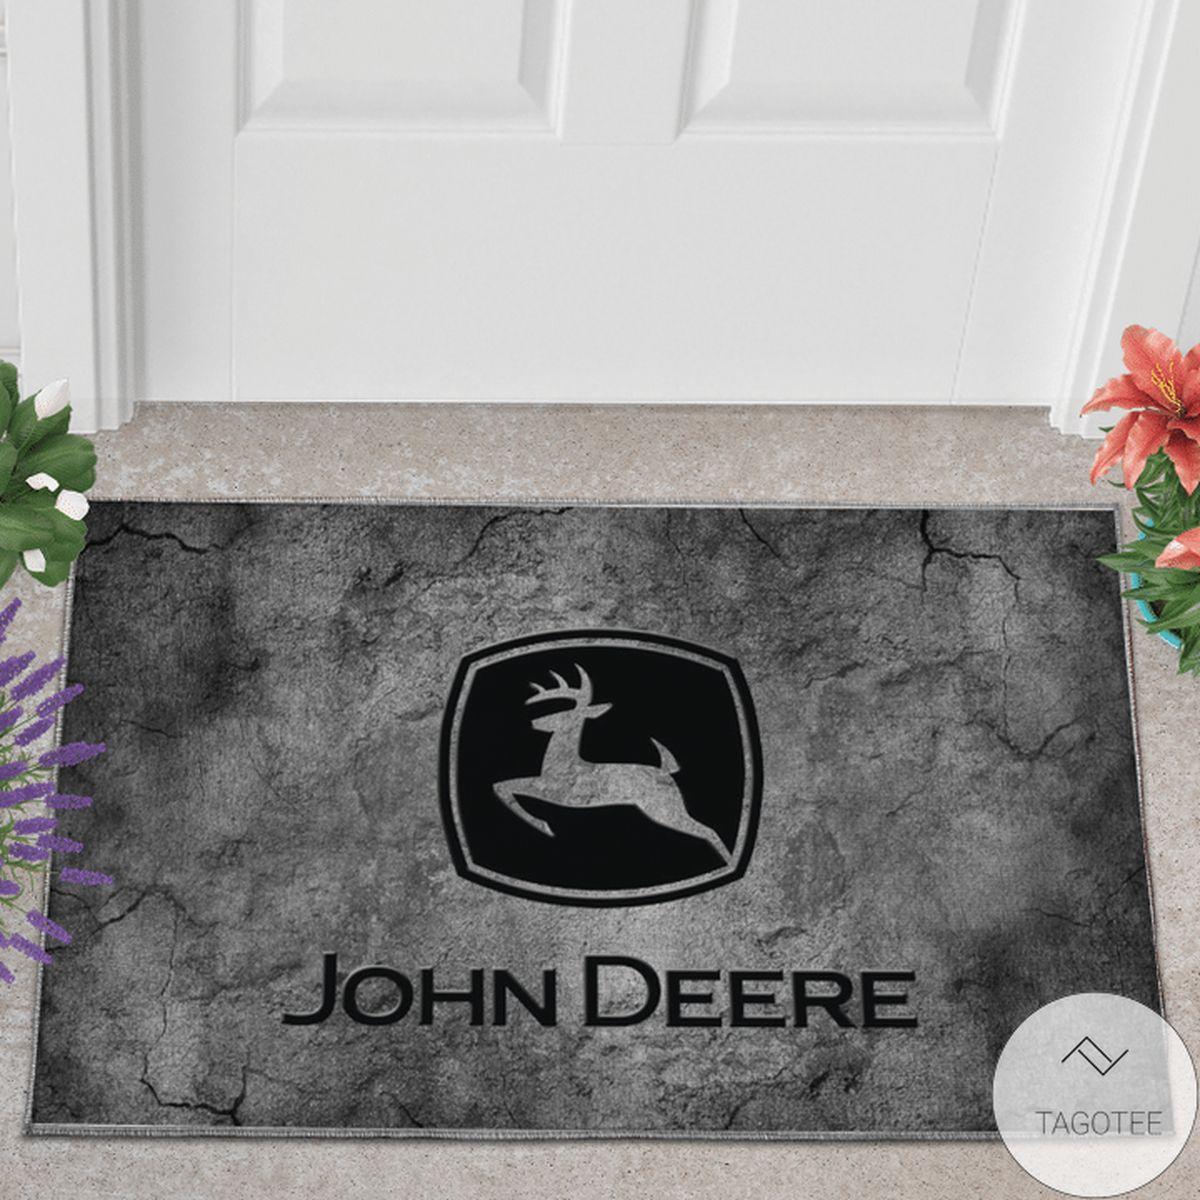 Perfect John Deere 3D Printed Doormat